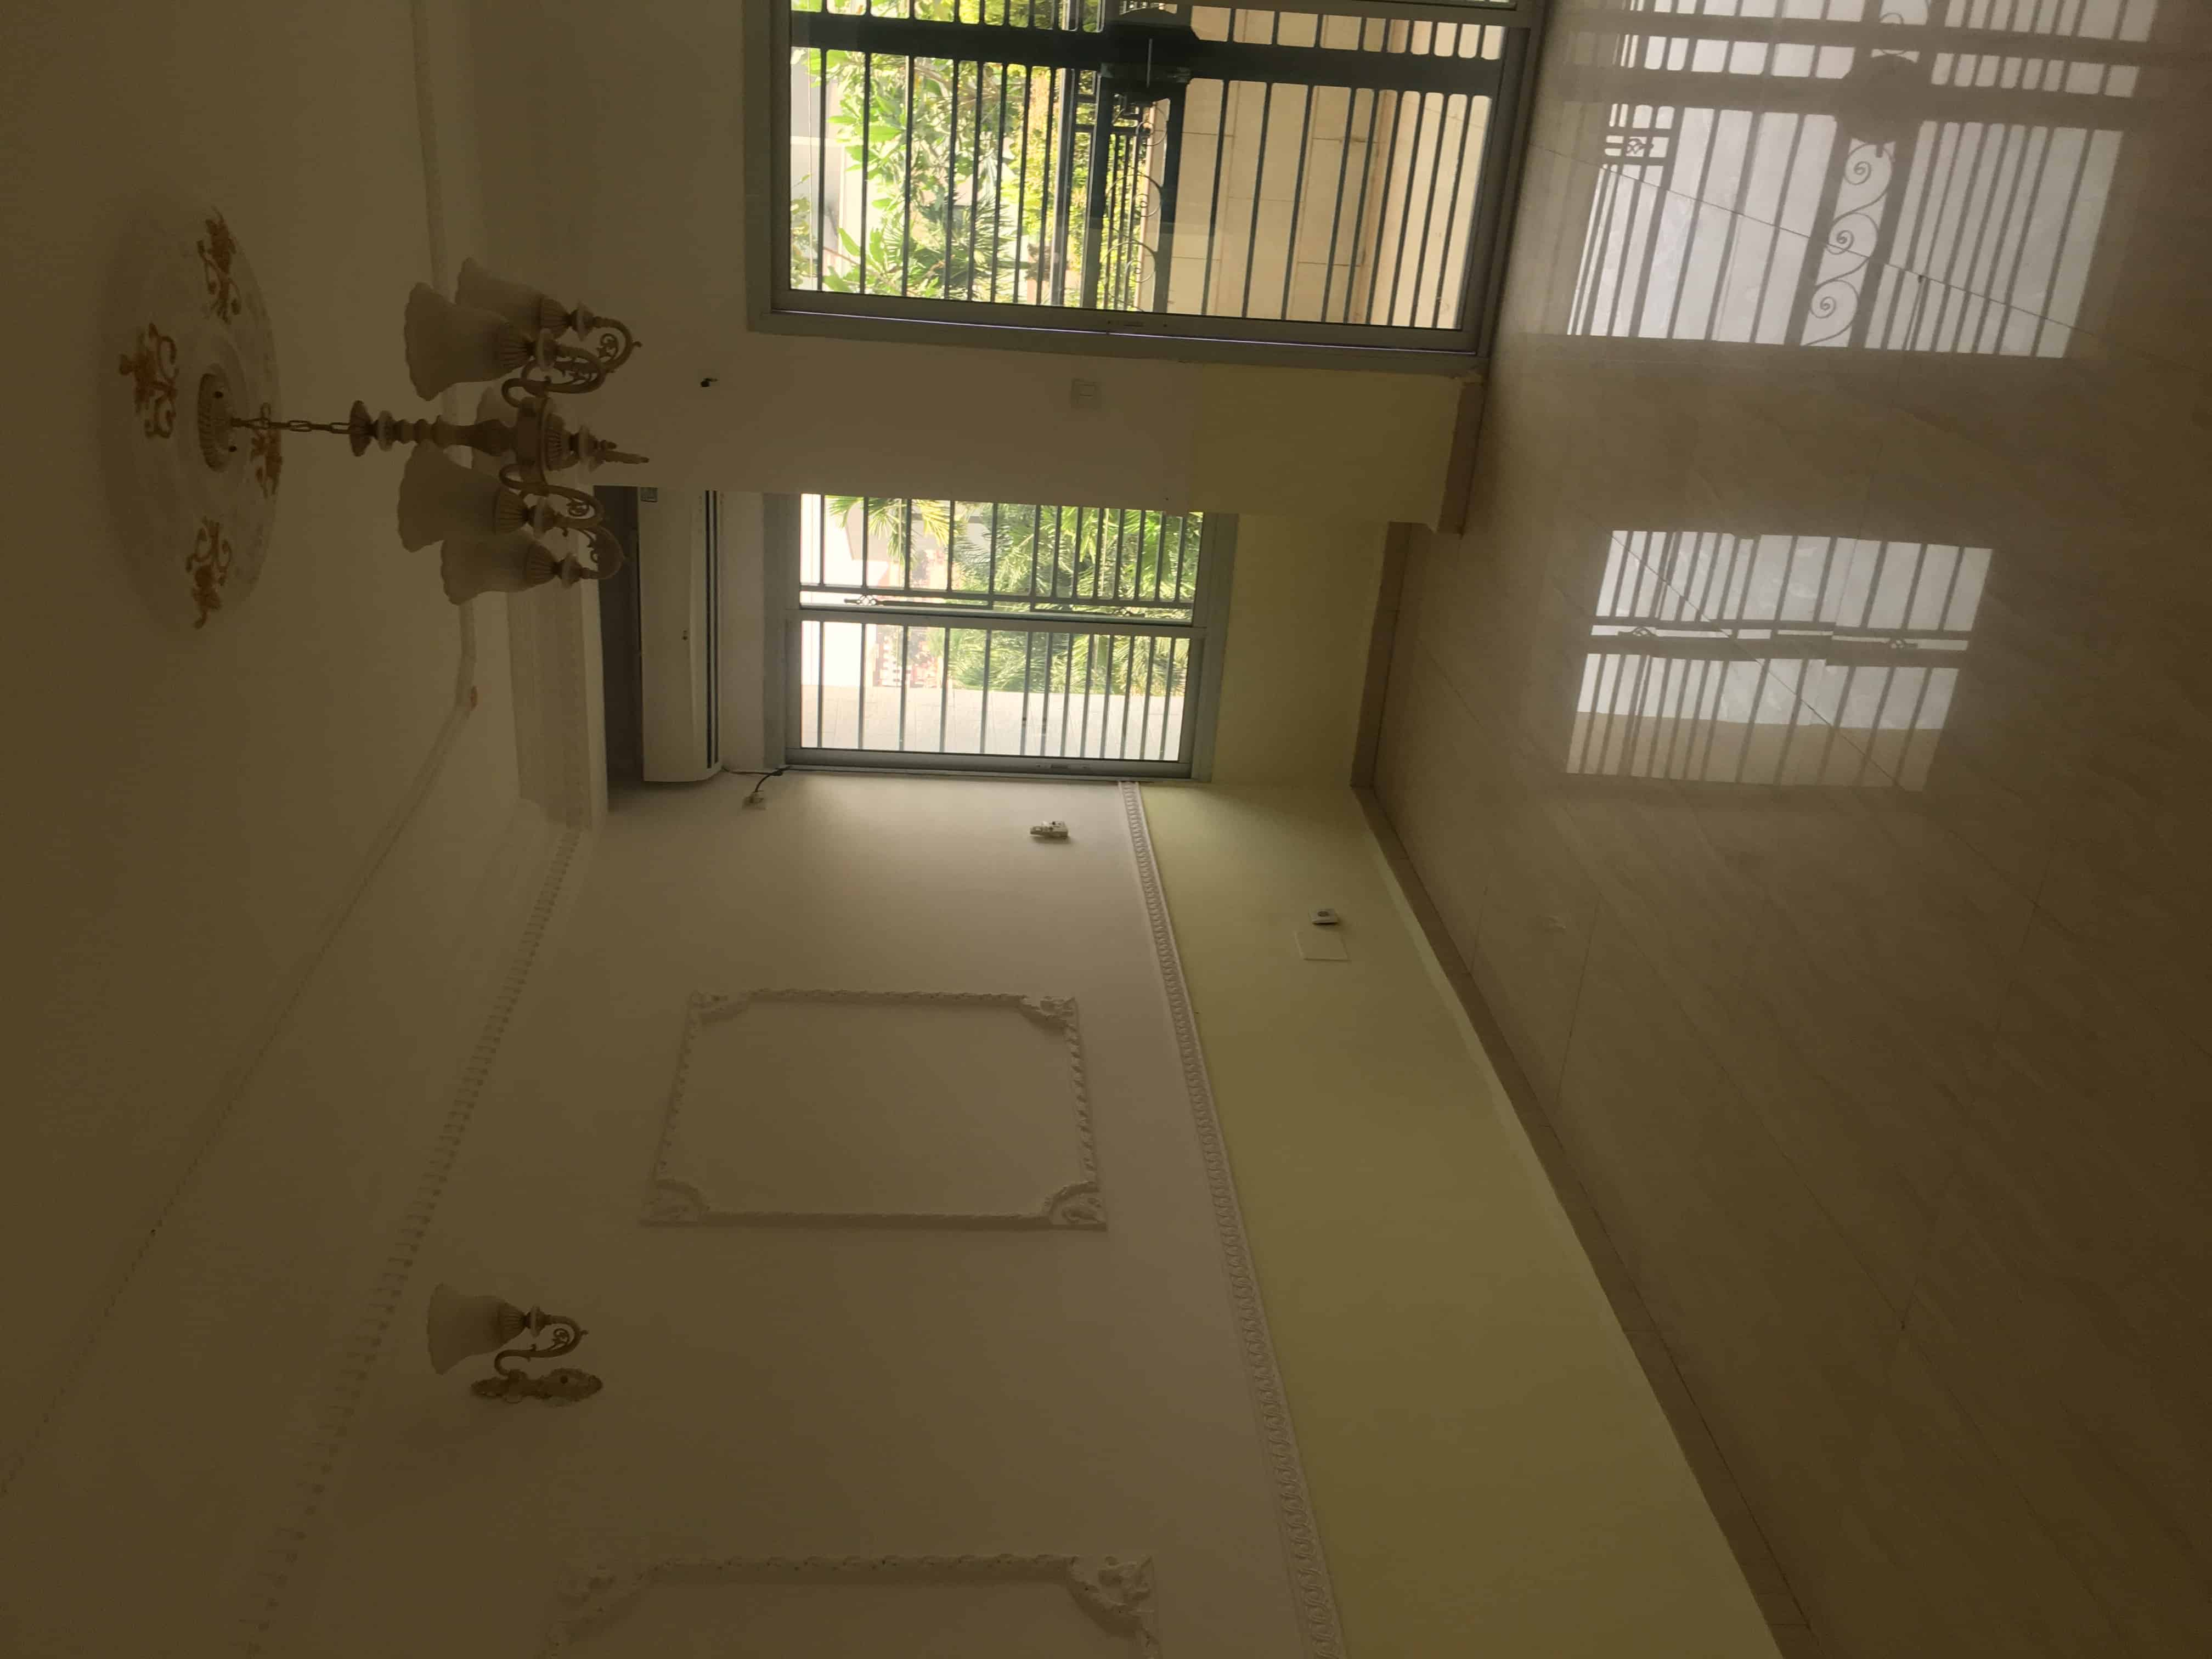 Apartment to rent - Yaoundé, Bastos, Carrefour - 1 living room(s), 2 bedroom(s), 1 bathroom(s) - 600 000 FCFA / month